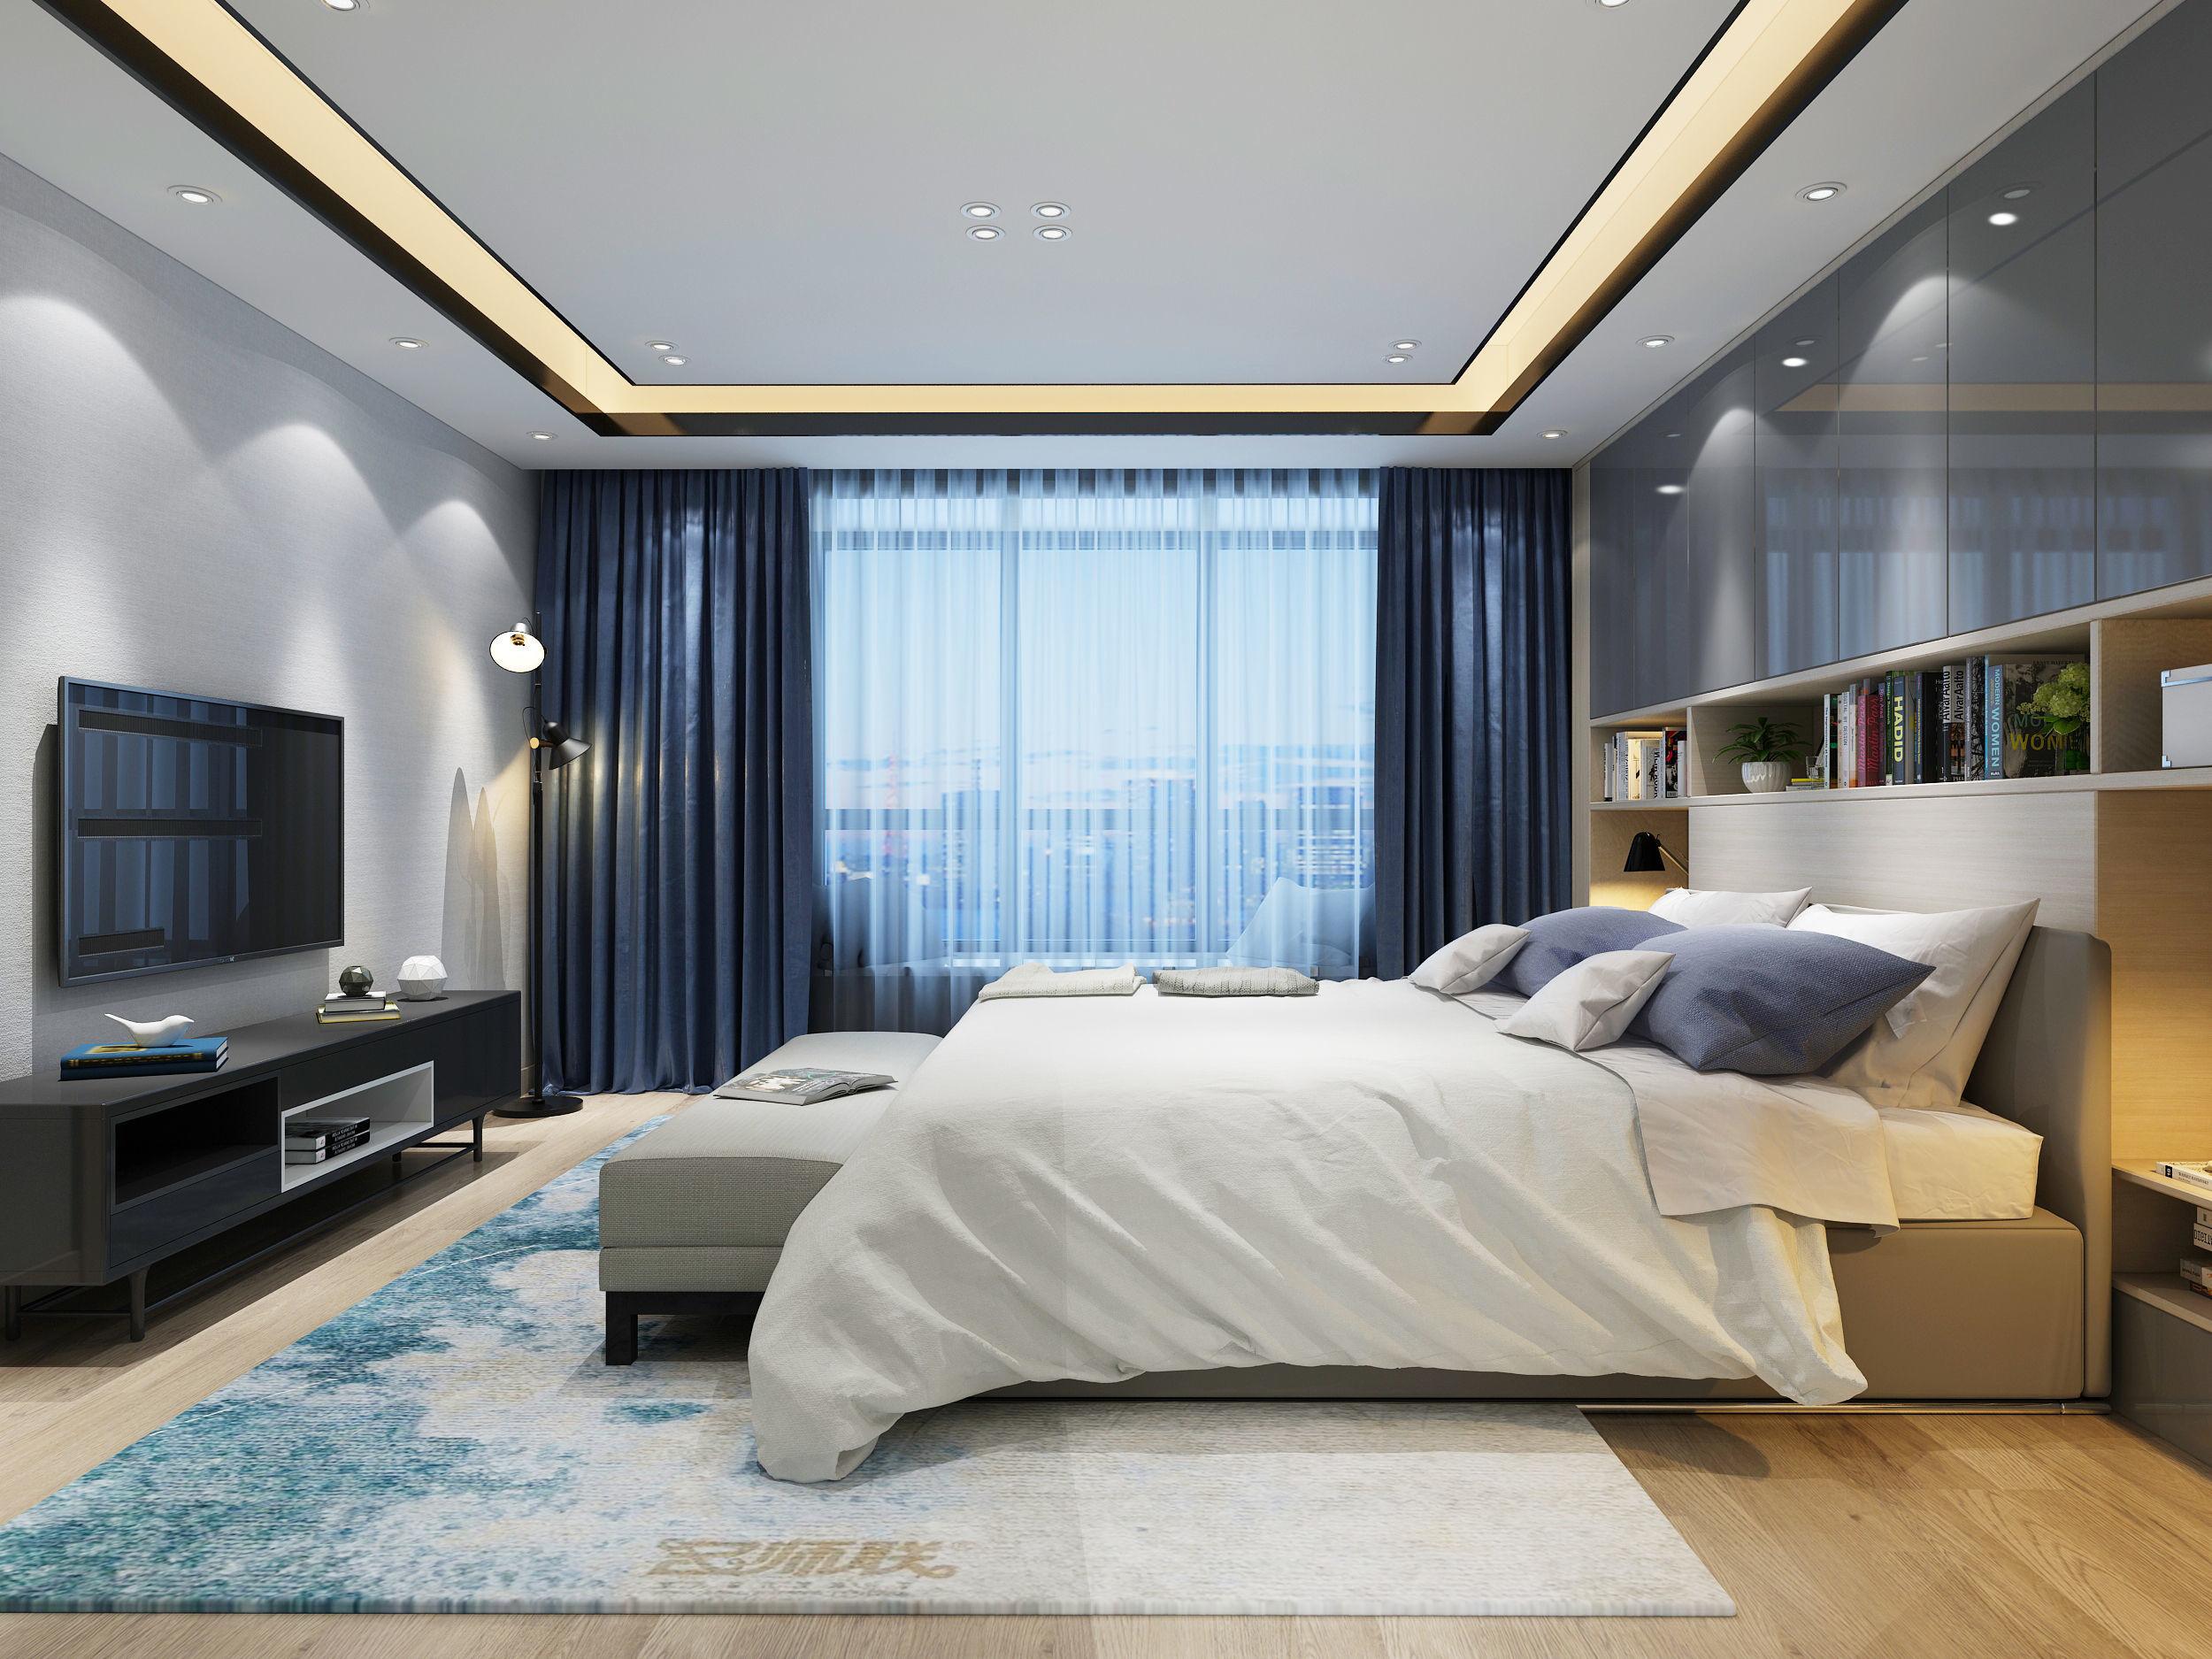 BEDROOM DESIGN 3D model bedroom | CGTrader on Model Bedroom Design  id=31997